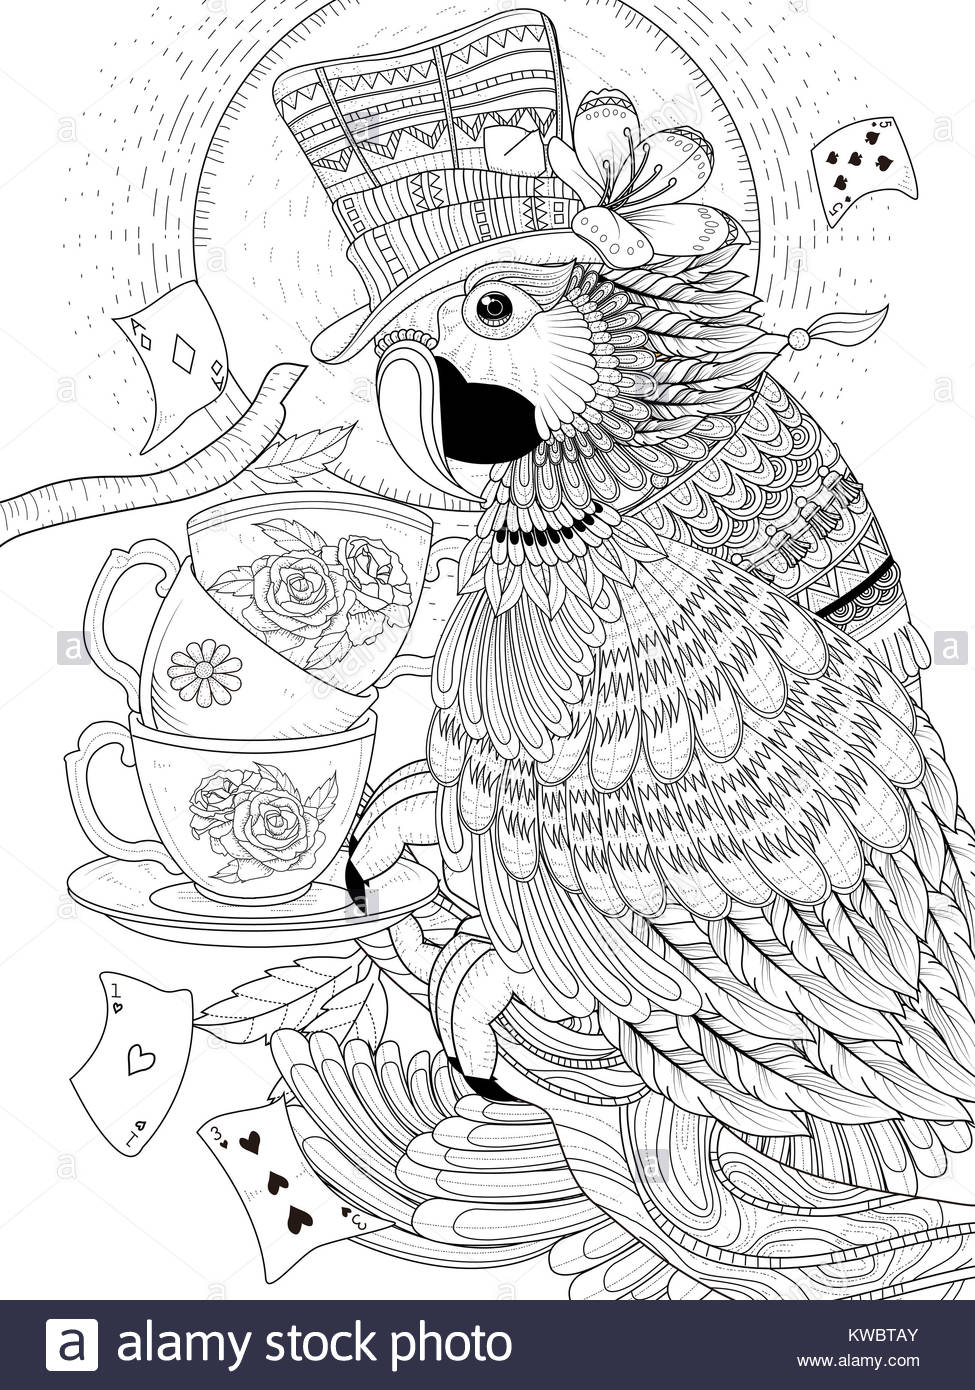 Parrot Vector Stockfotos & Parrot Vector Bilder - Alamy